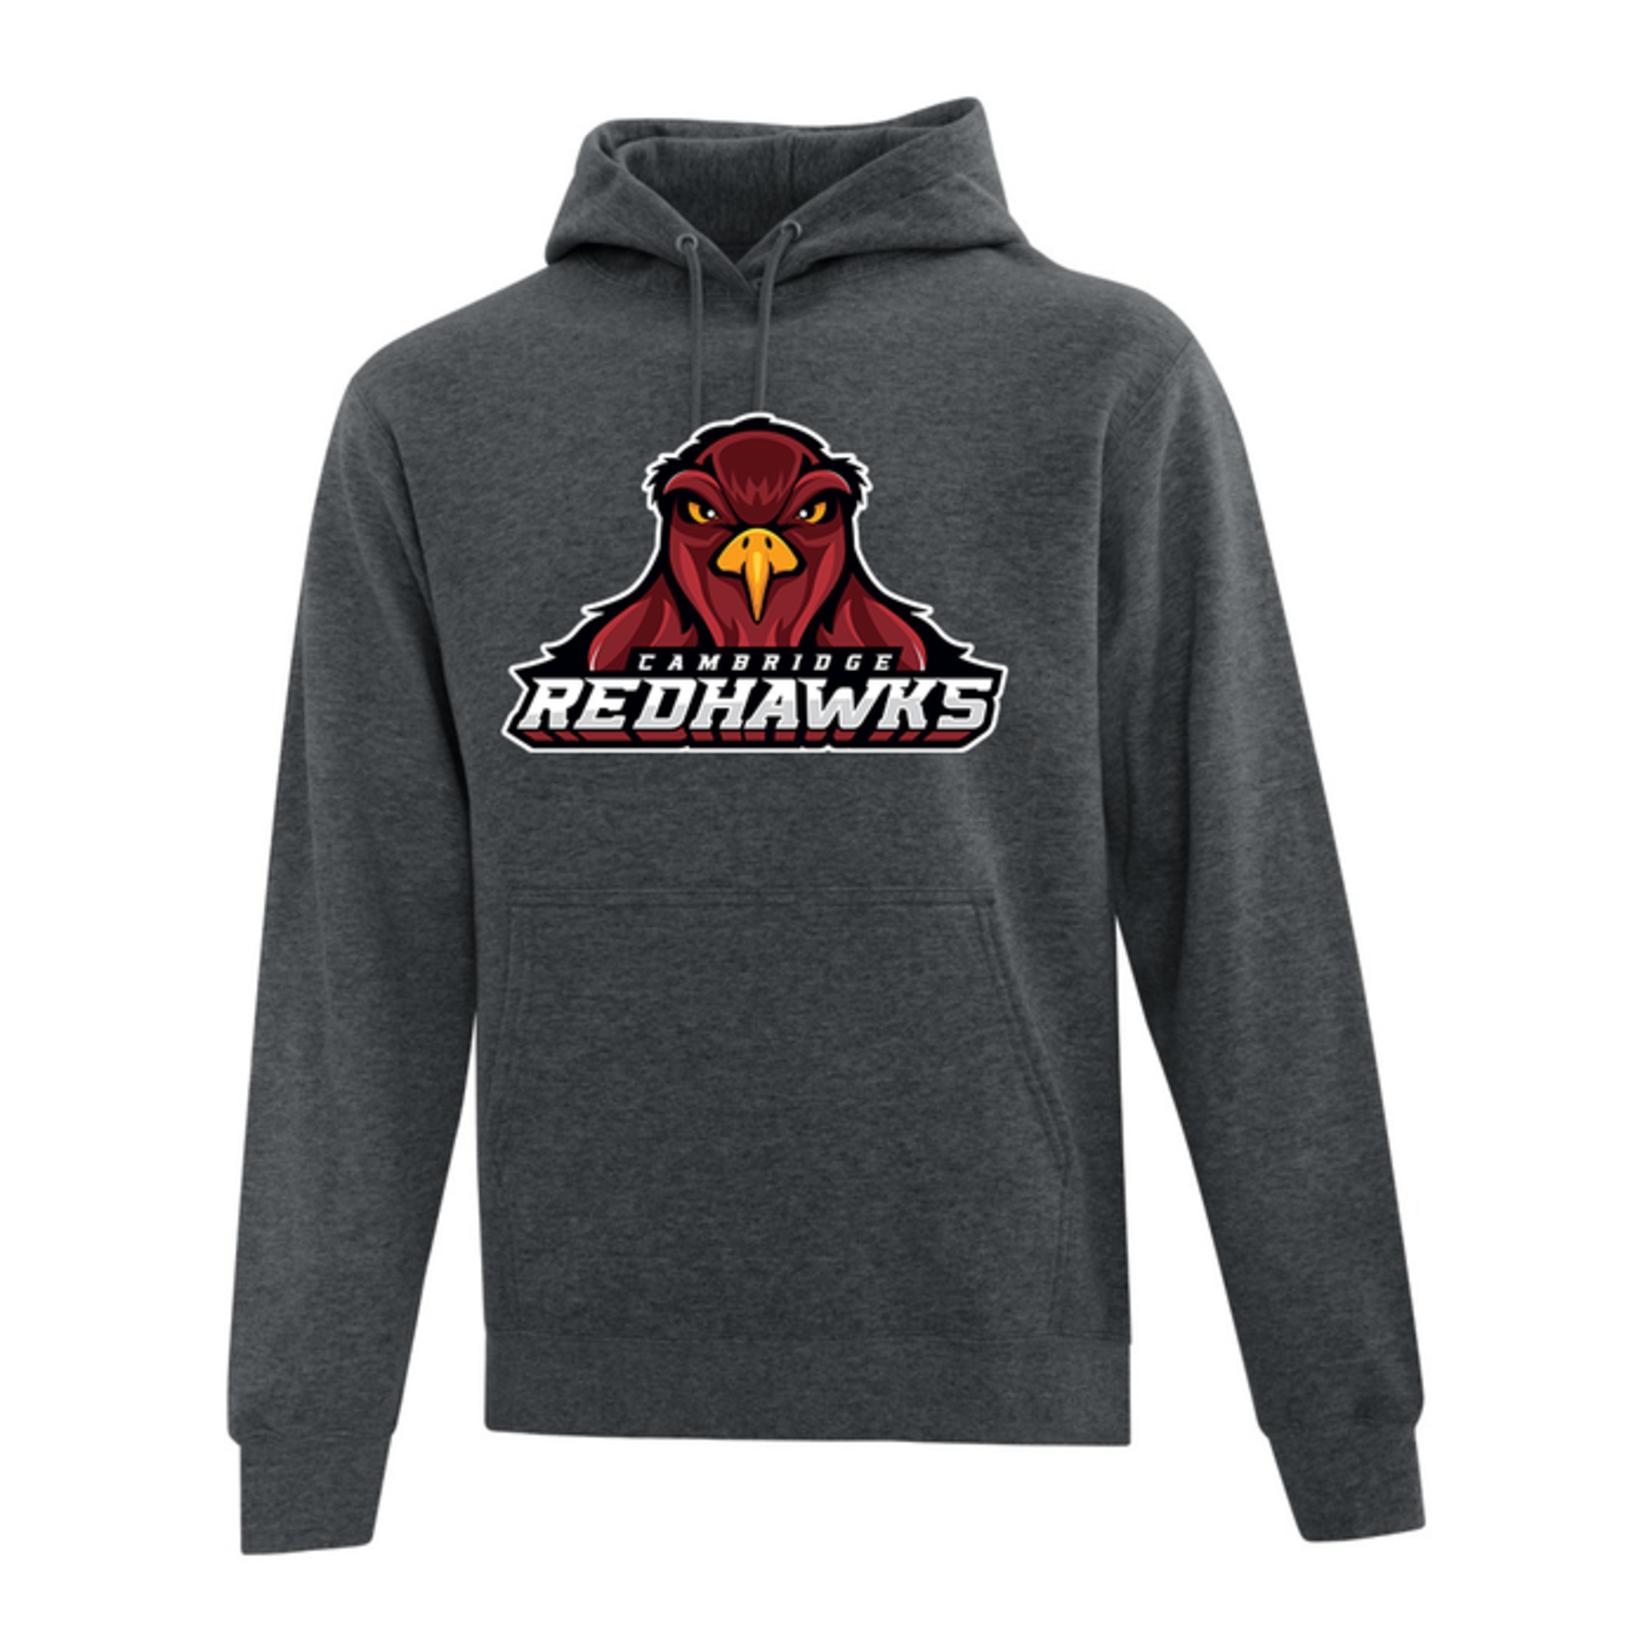 ATC Redhawks Hoody - Adult